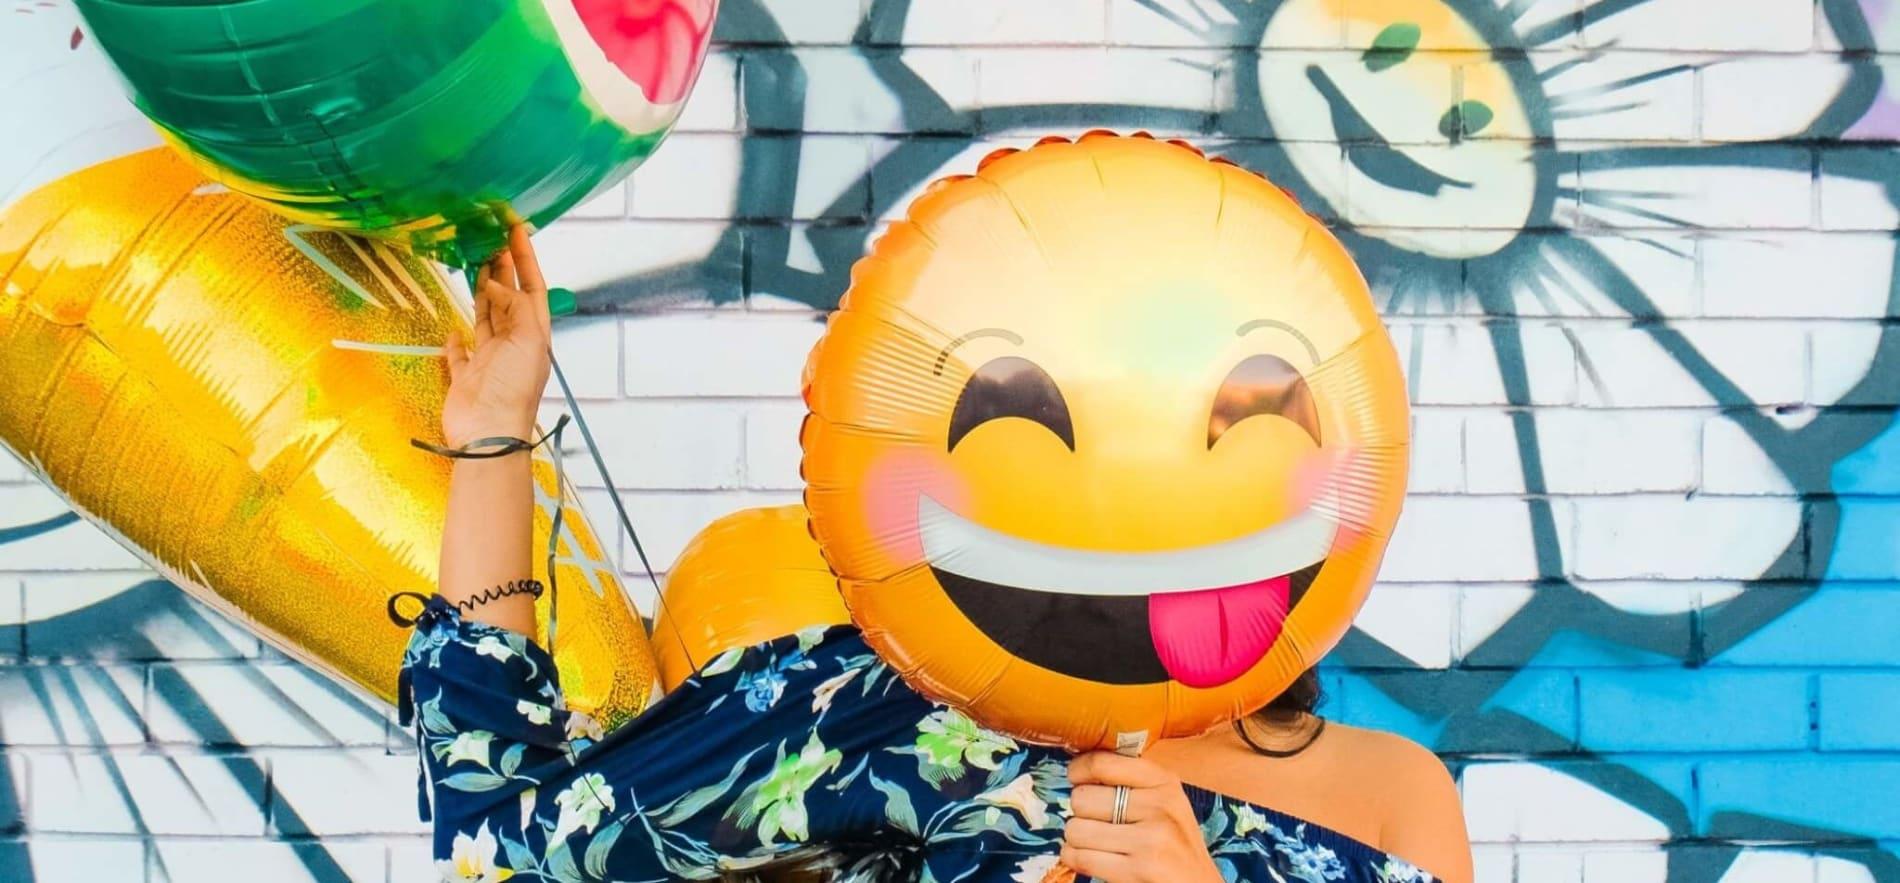 Happiness at work week highlights and top tips - lidya-nada-_0aKQa9gr4s-unsplash-e1569509661762.jpg